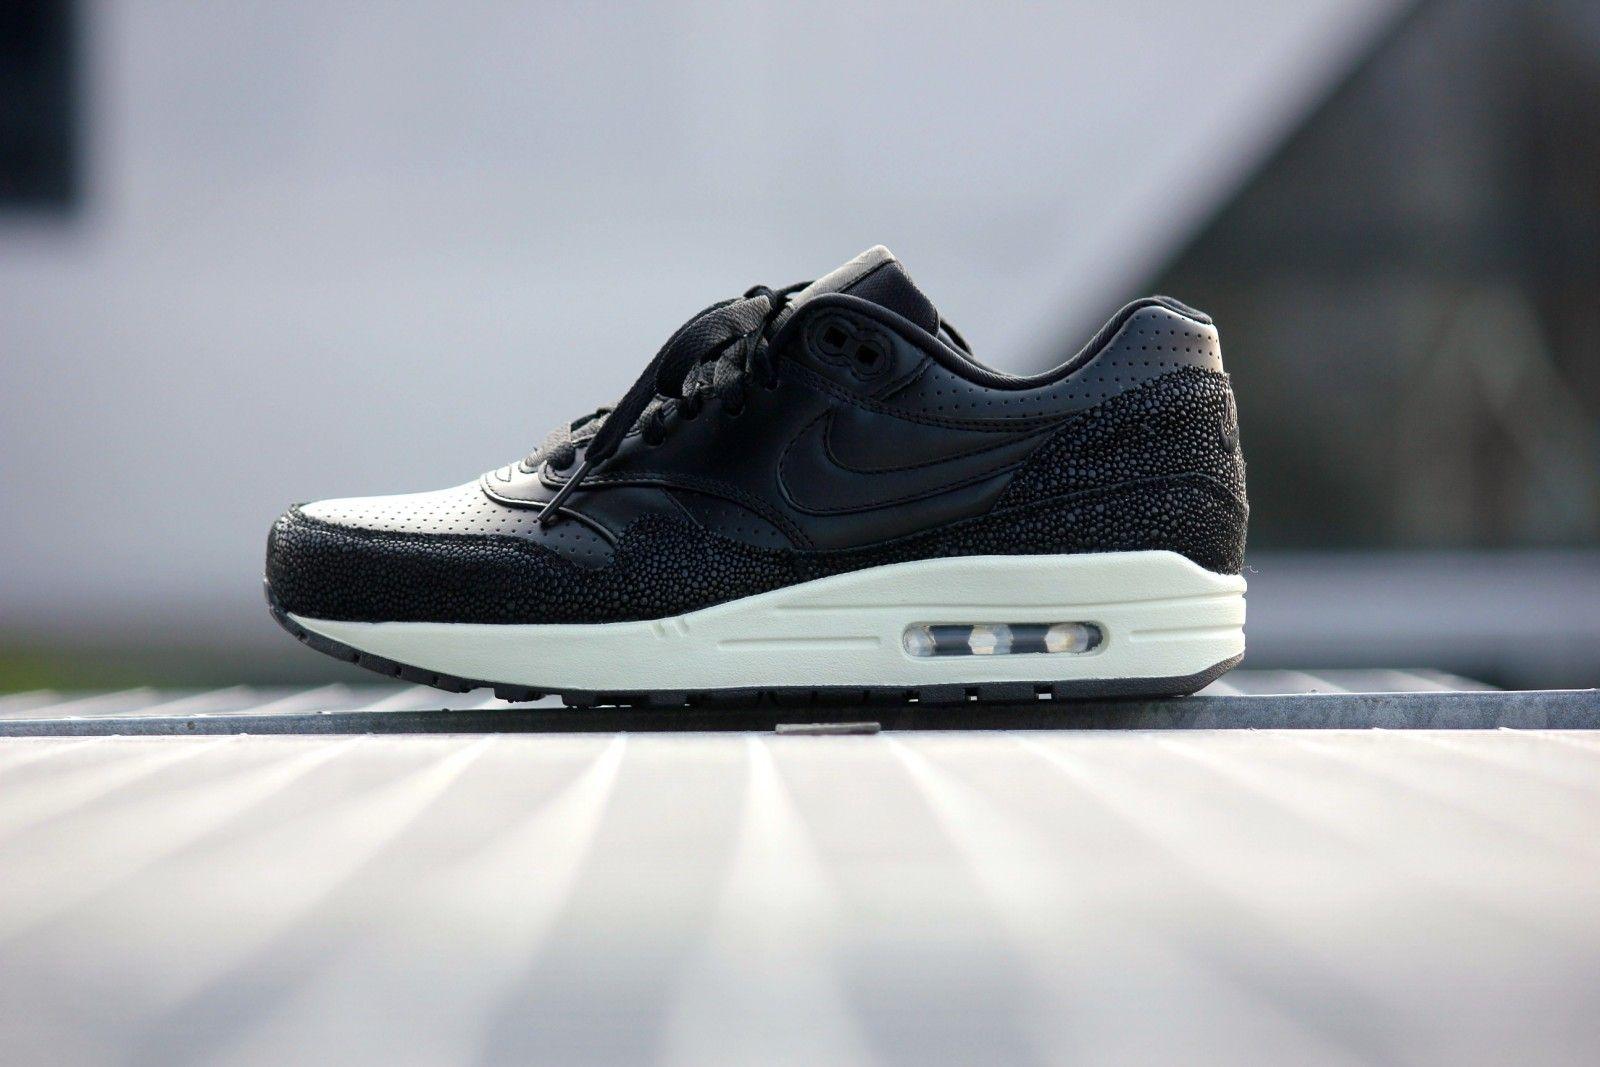 Nike Air max 1 LTR PA Stingray Black Black - 705007-001